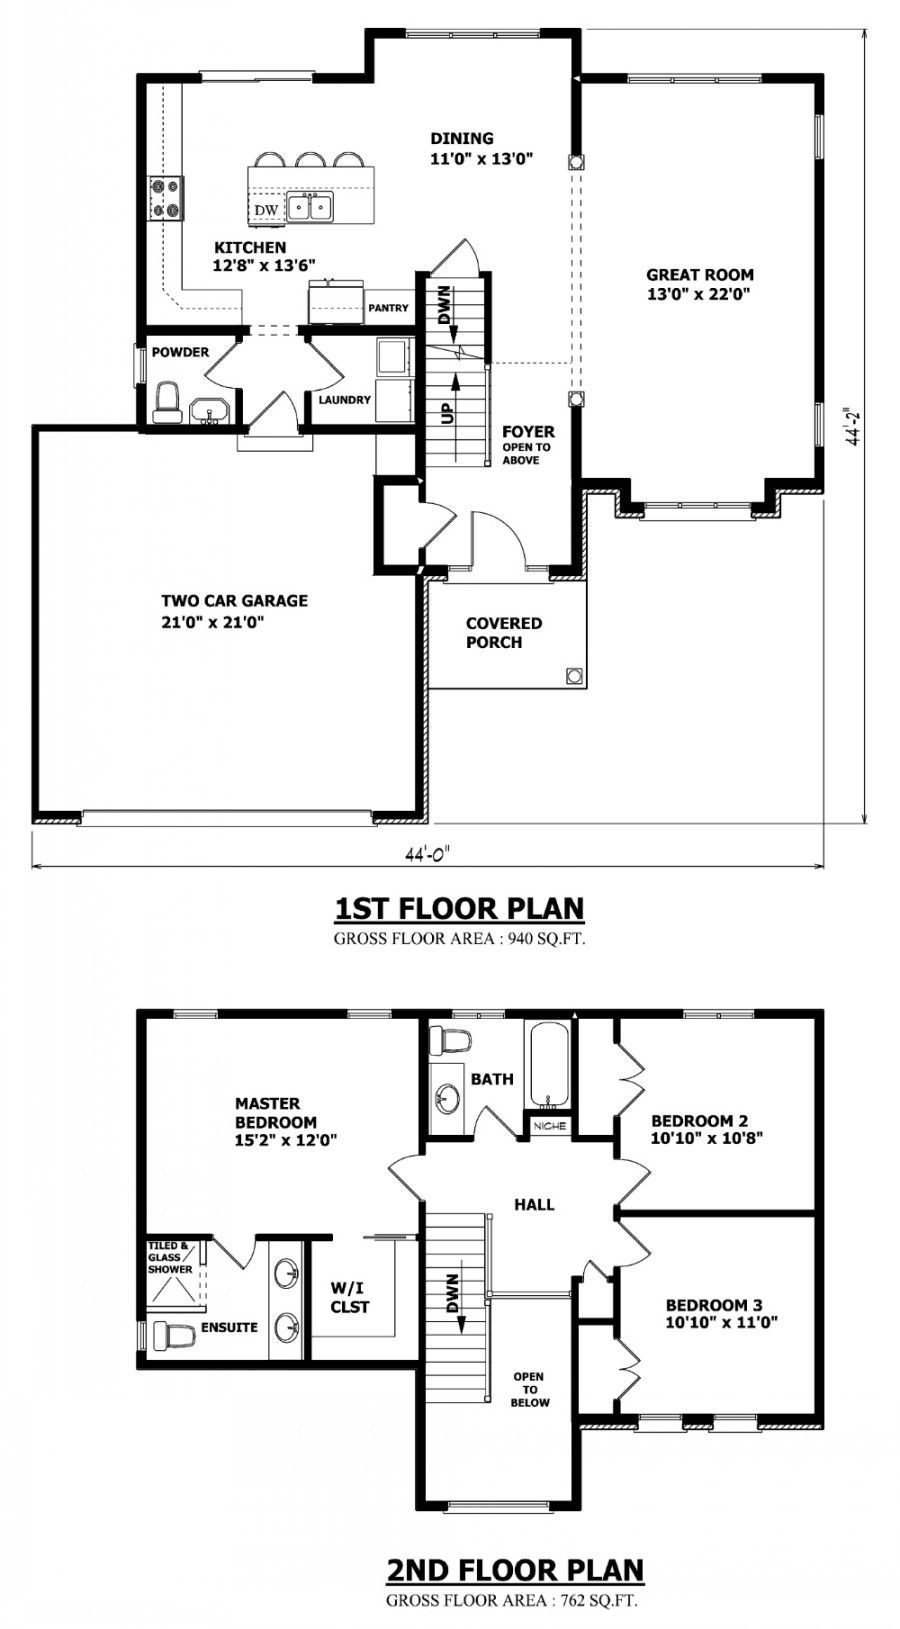 Marvelous 17 Best Images About 2 Story Plans On Pinterest House Plans Largest Home Design Picture Inspirations Pitcheantrous